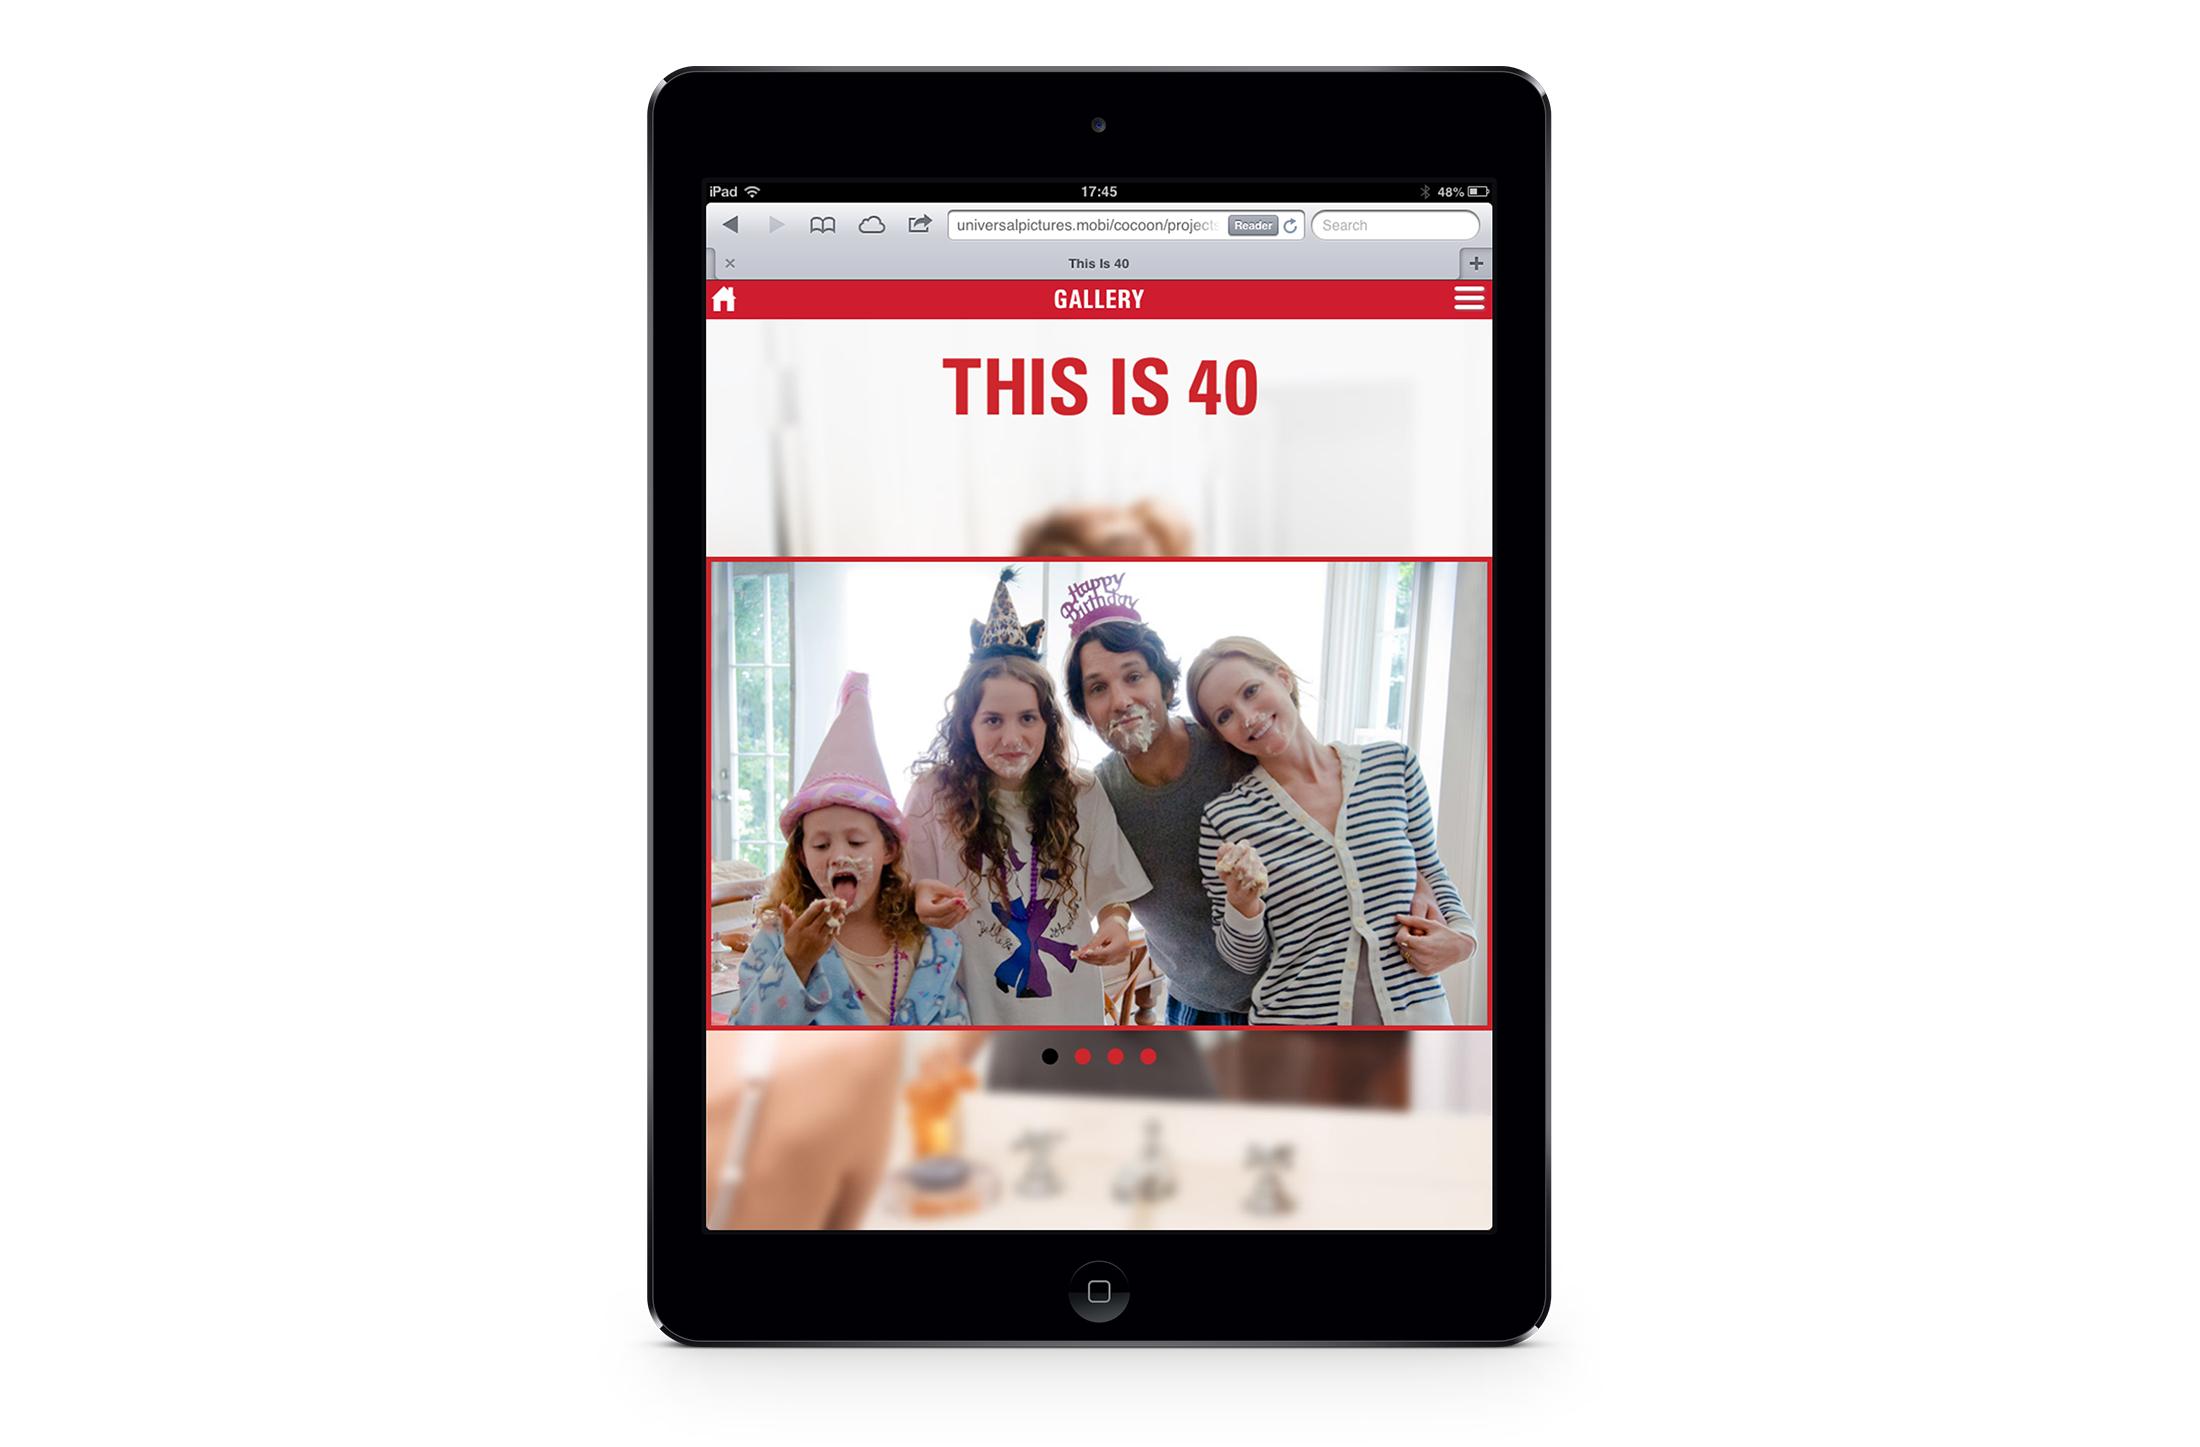 iPad: gallery screen.